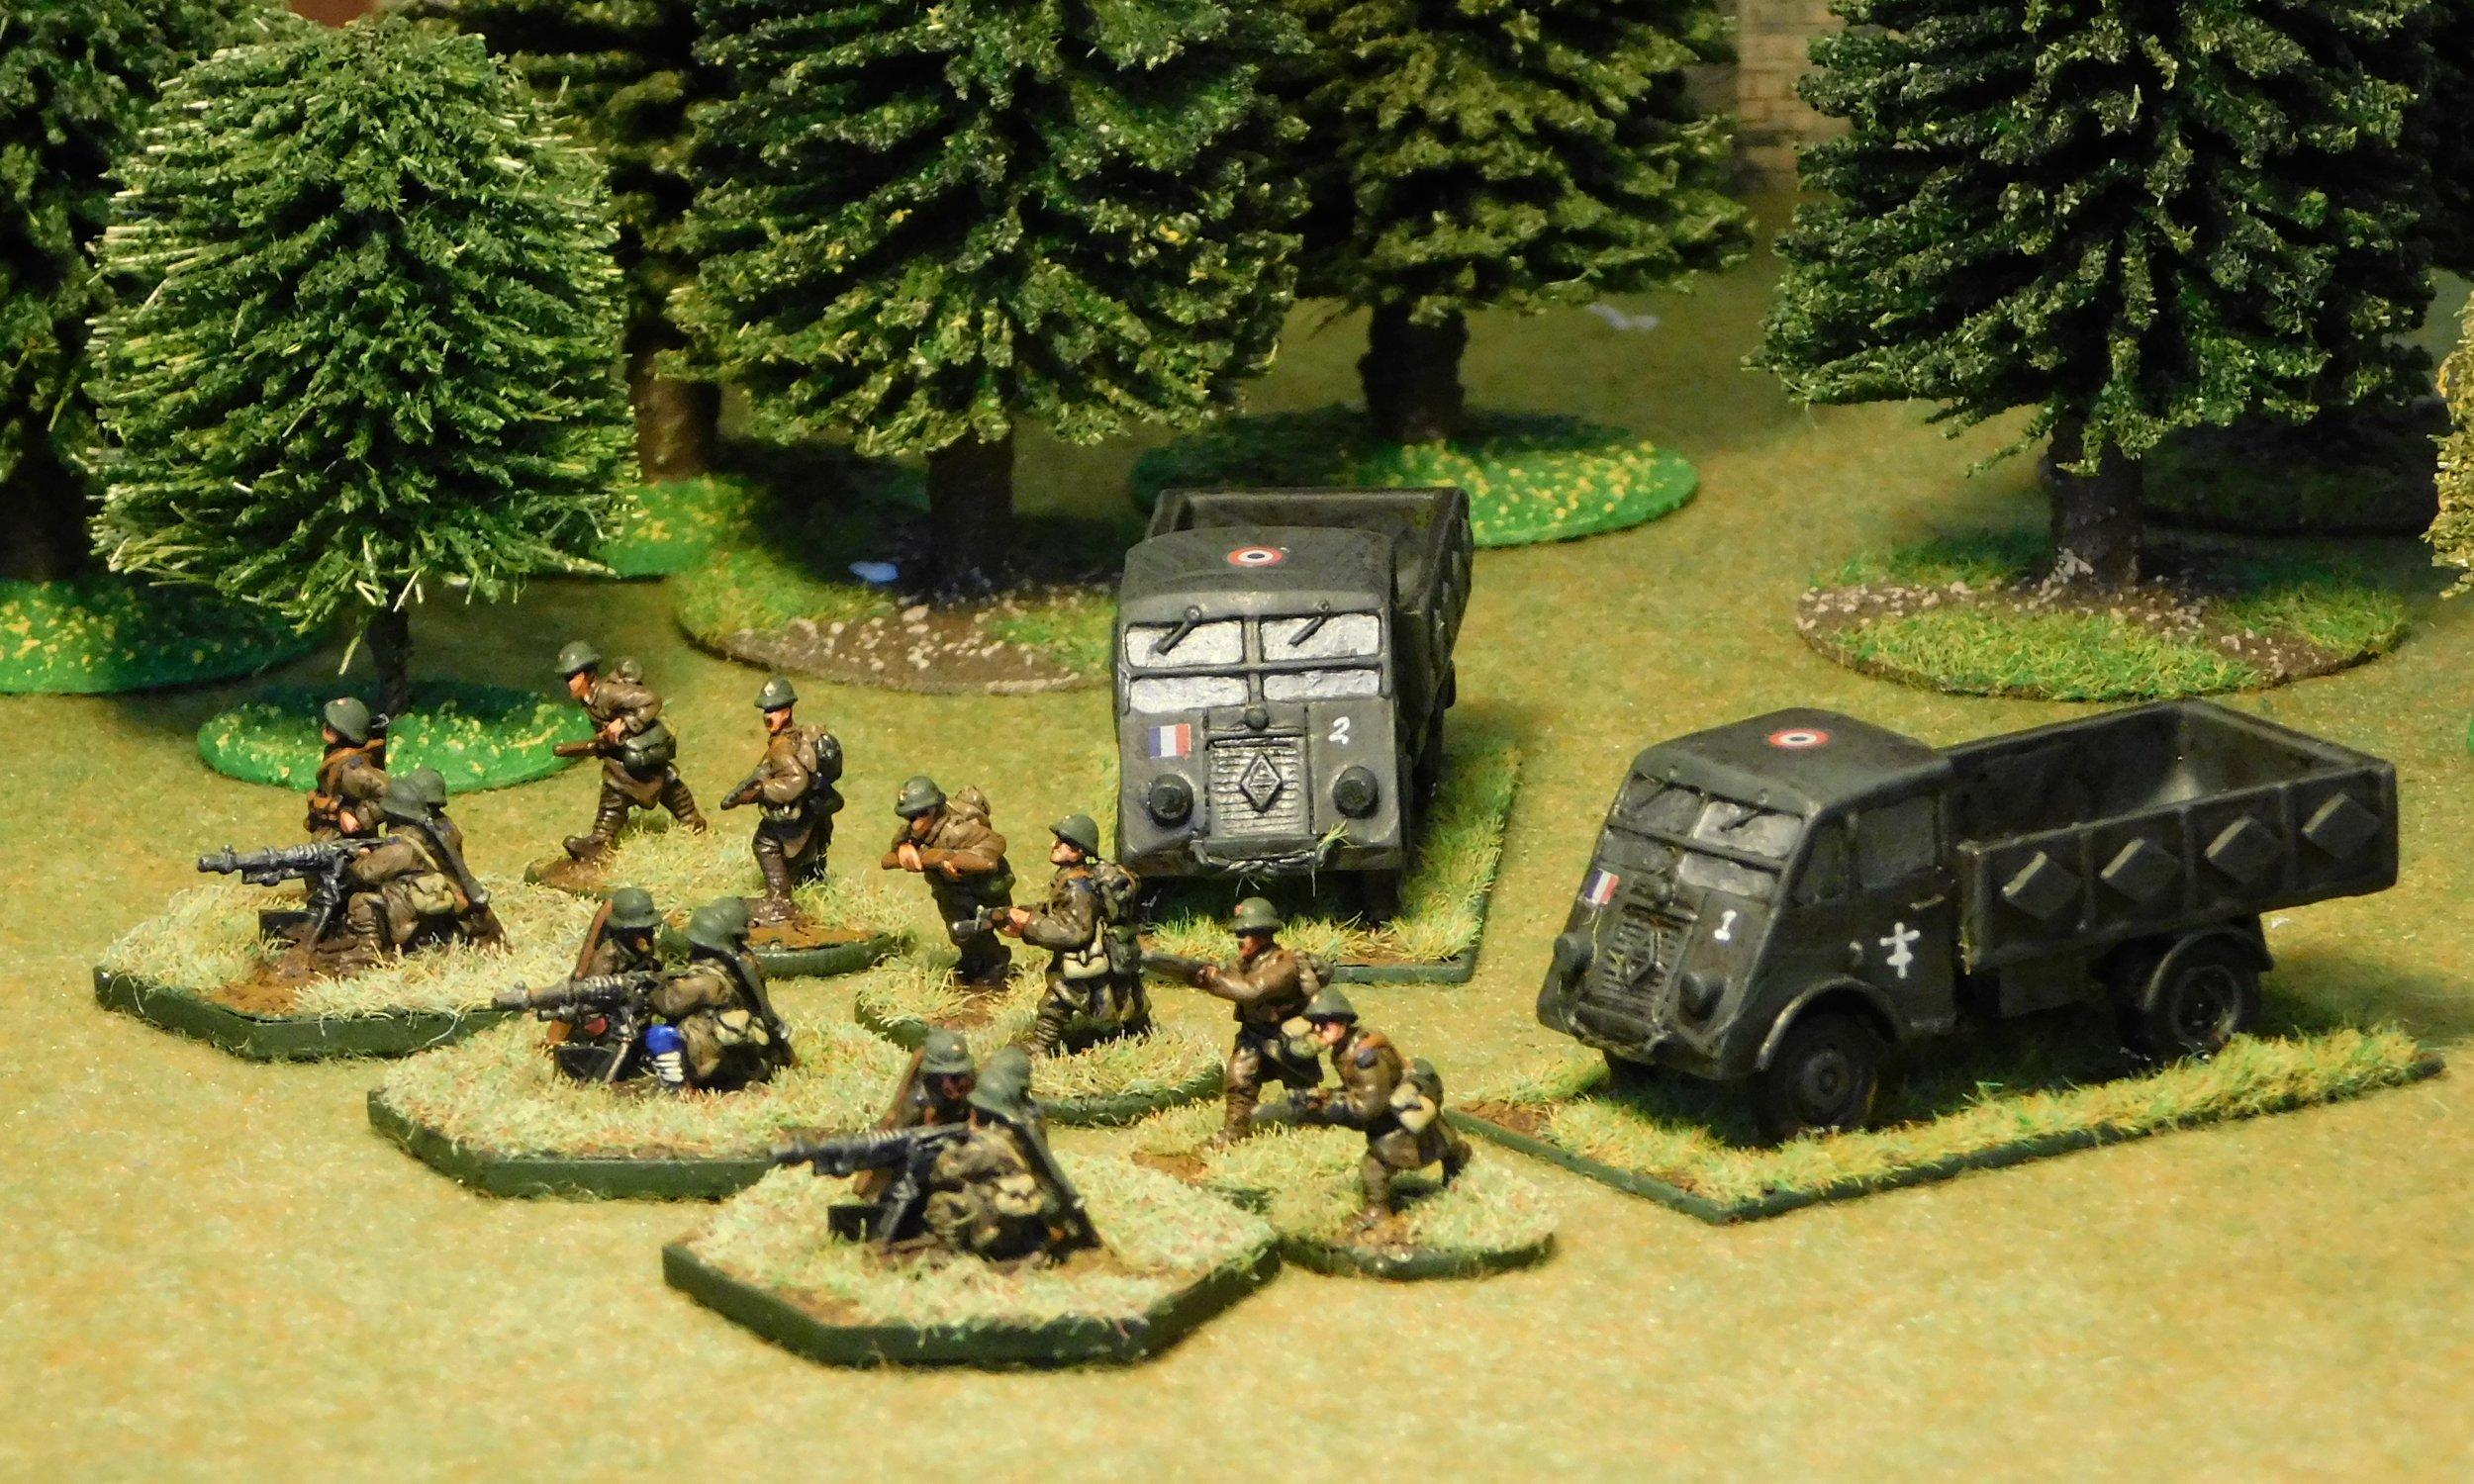 1st MMG Platoon (remnants)